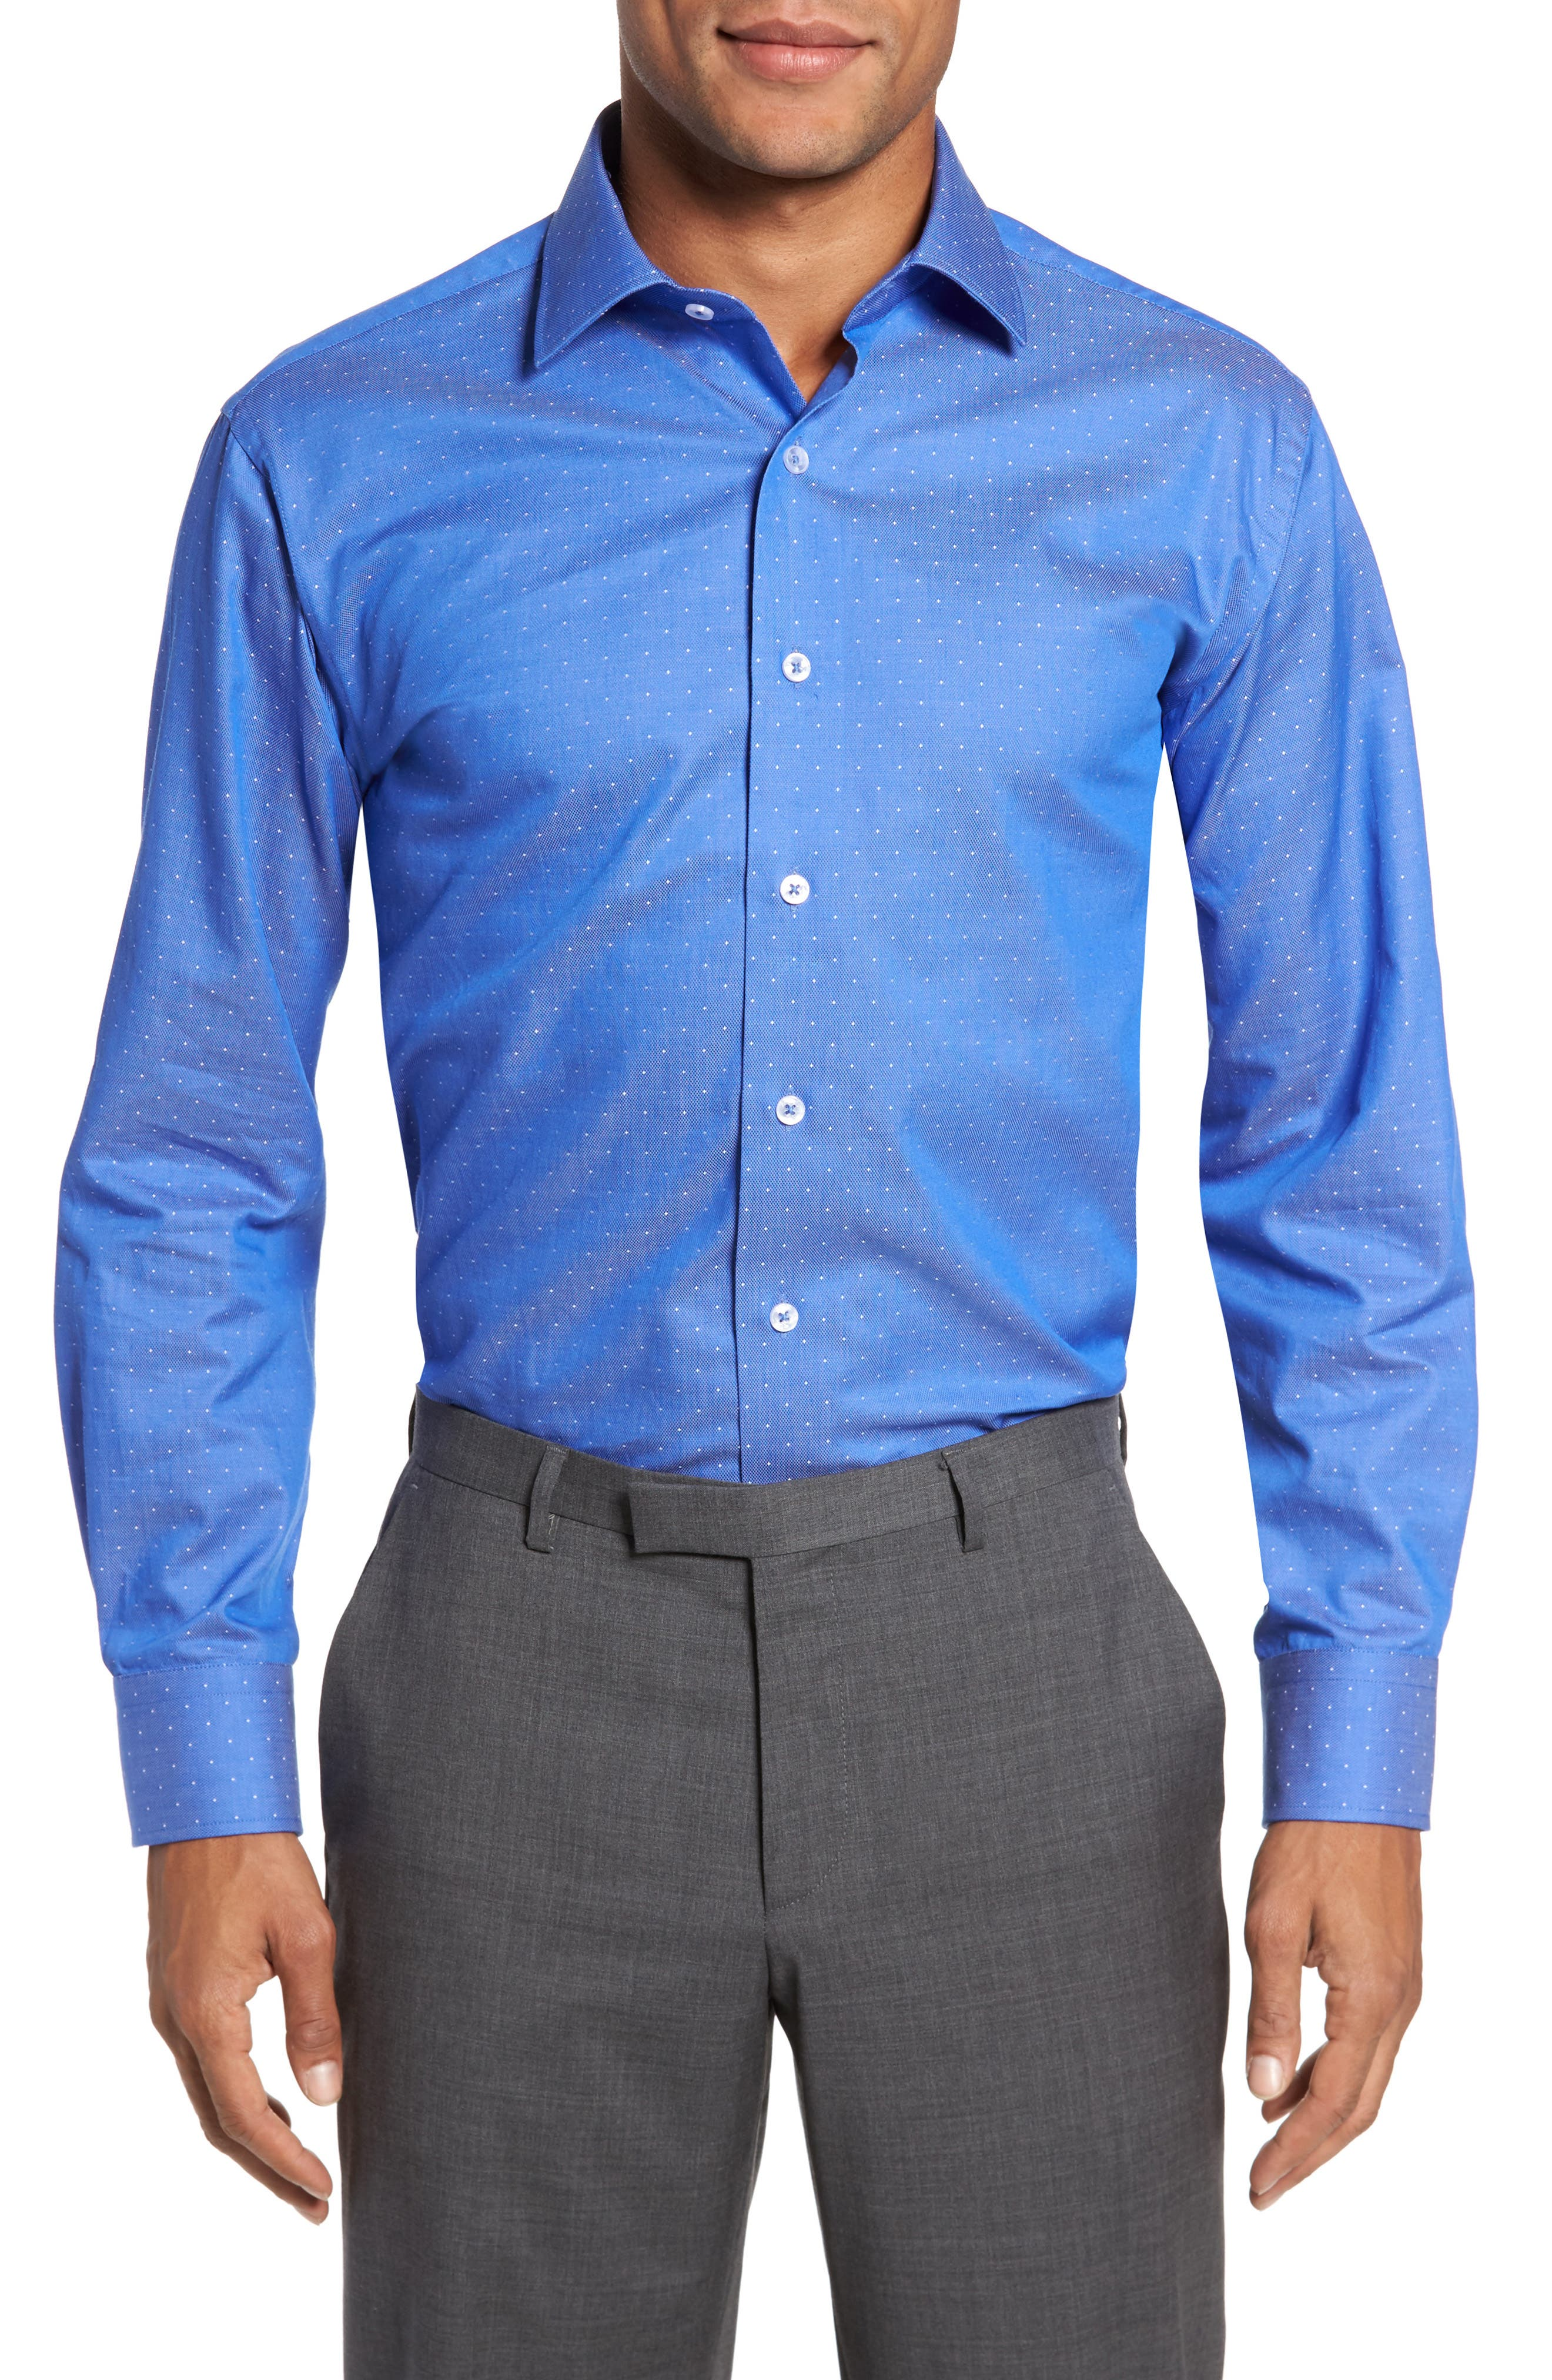 LORENZO UOMO Trim Fit Dot Dress Shirt, Main, color, ROYAL